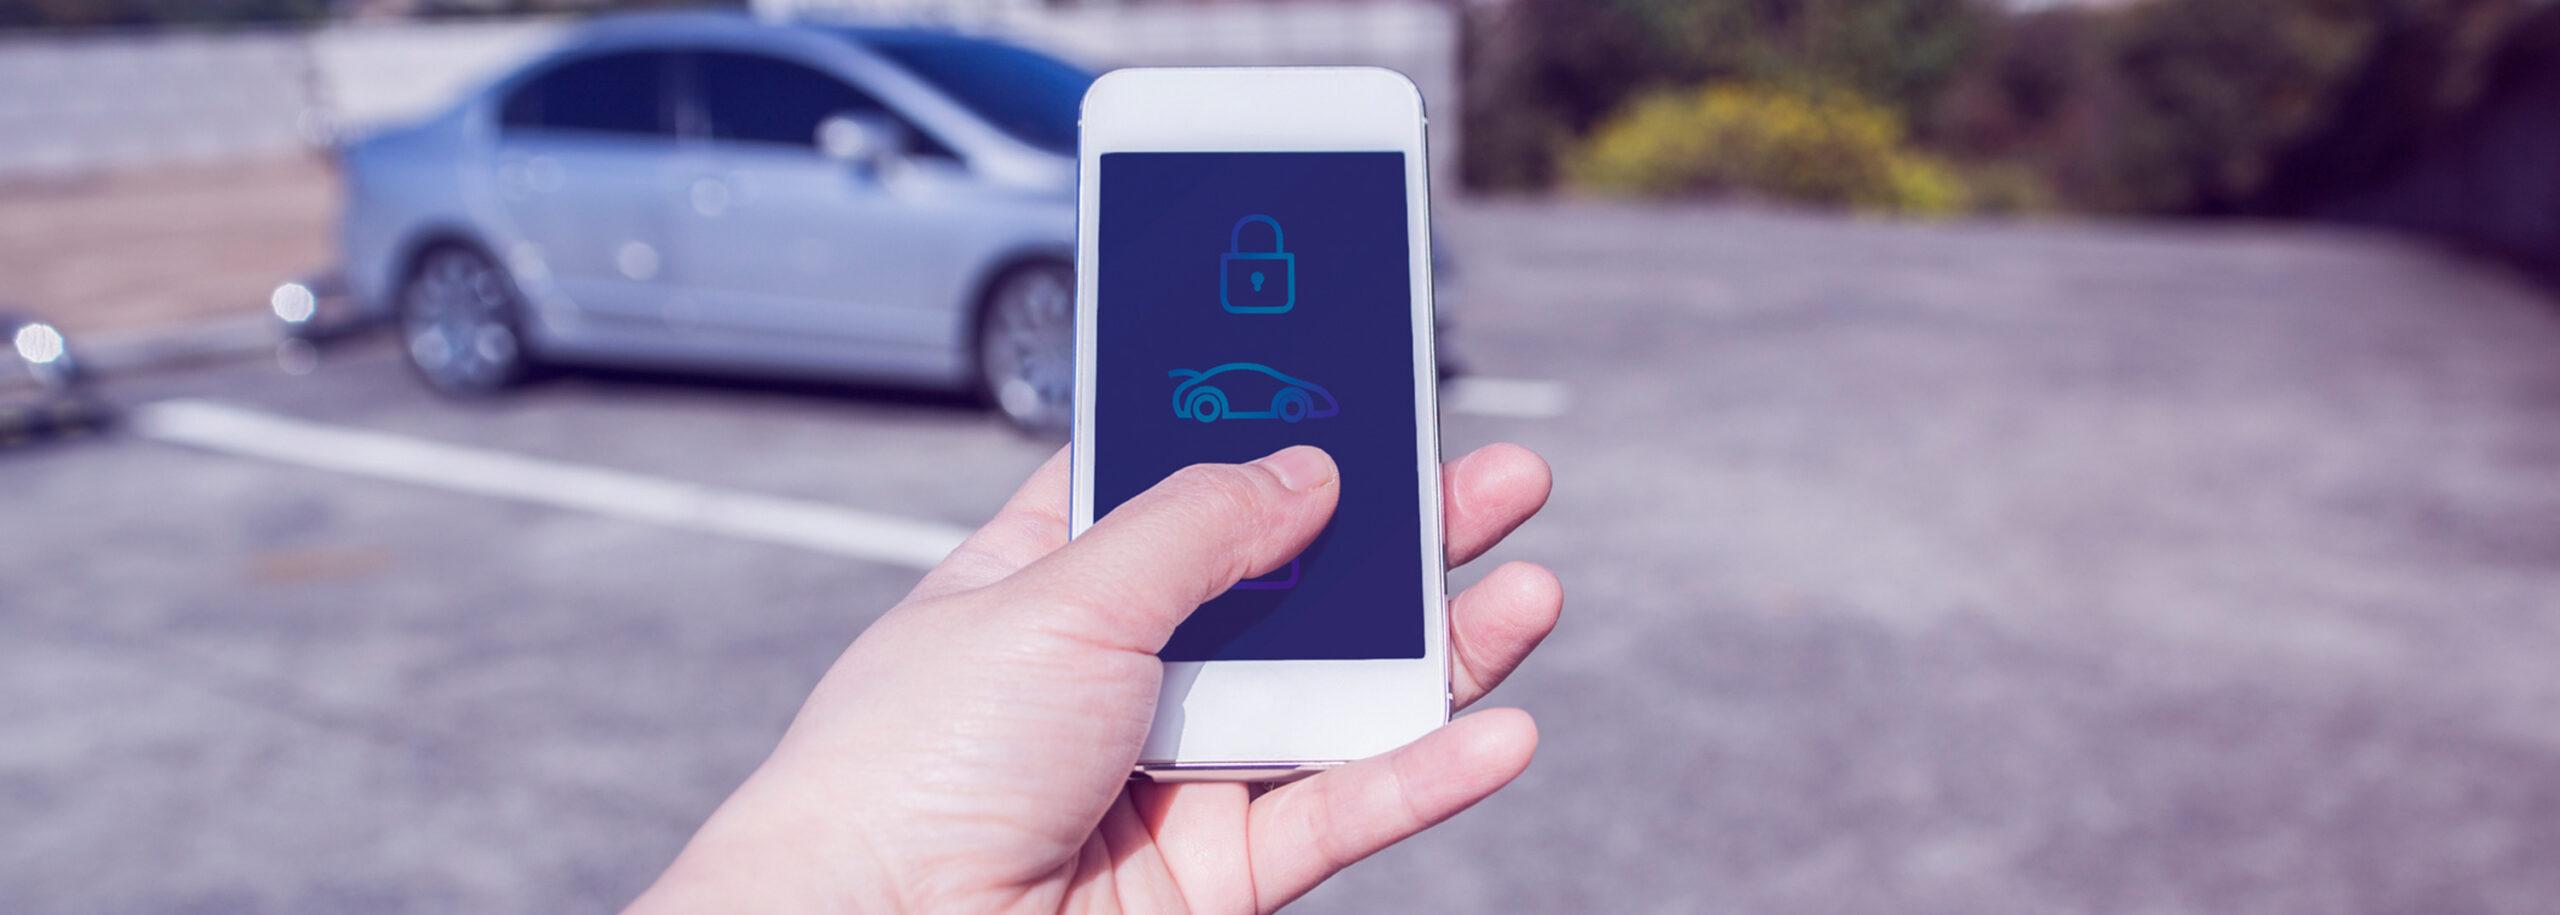 EV Charging Station App Account